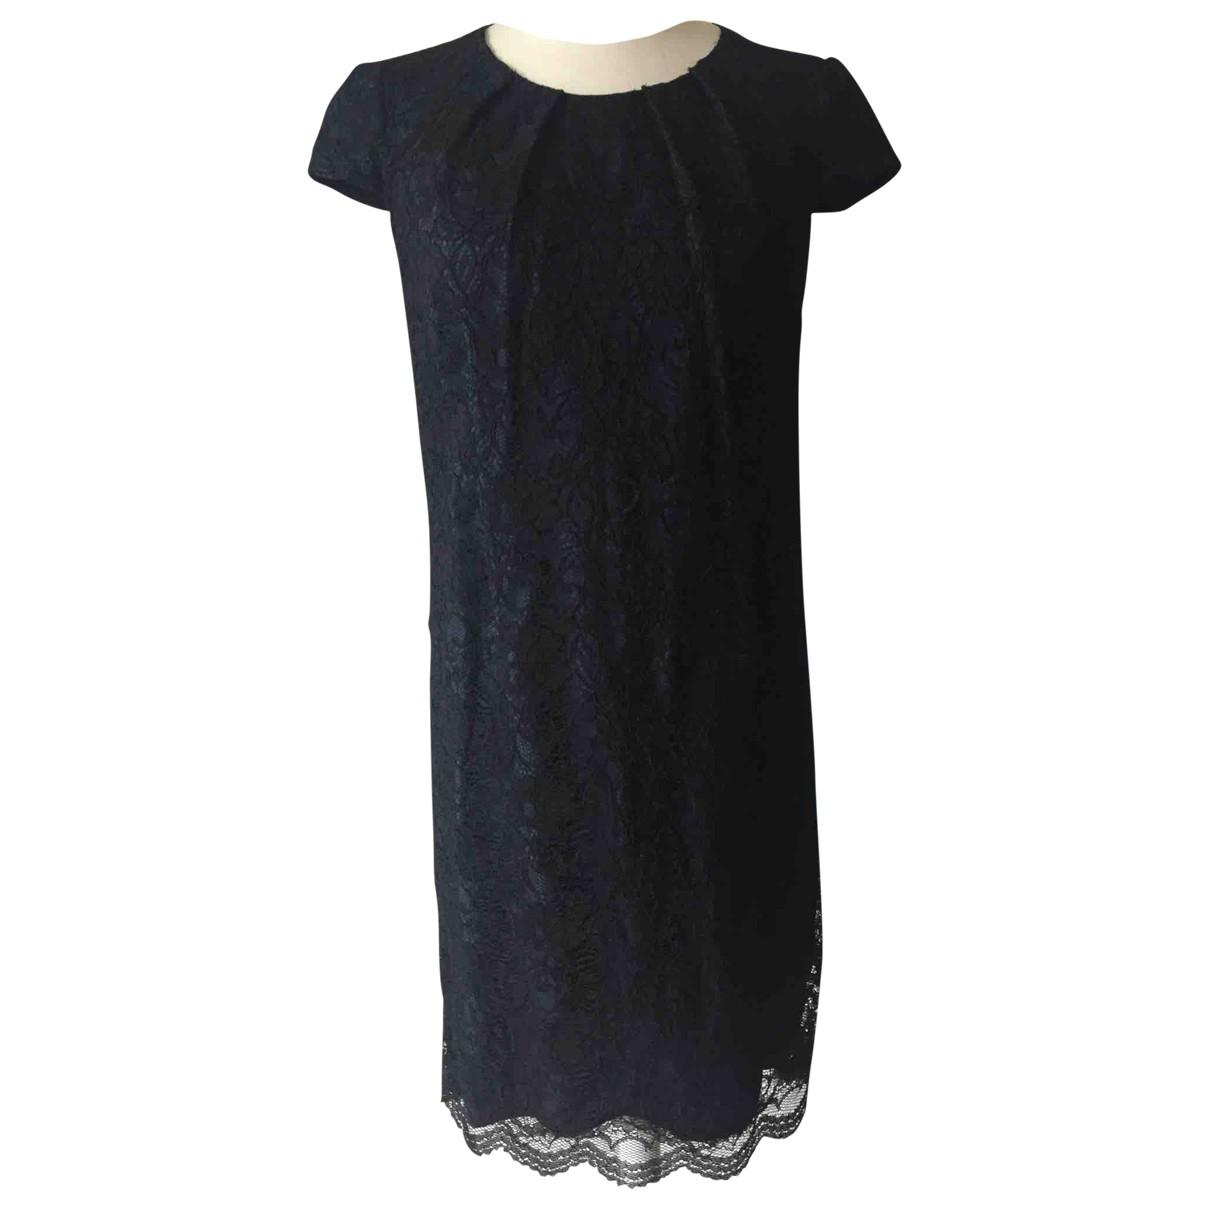 Gerard Darel \N Black dress for Women S International